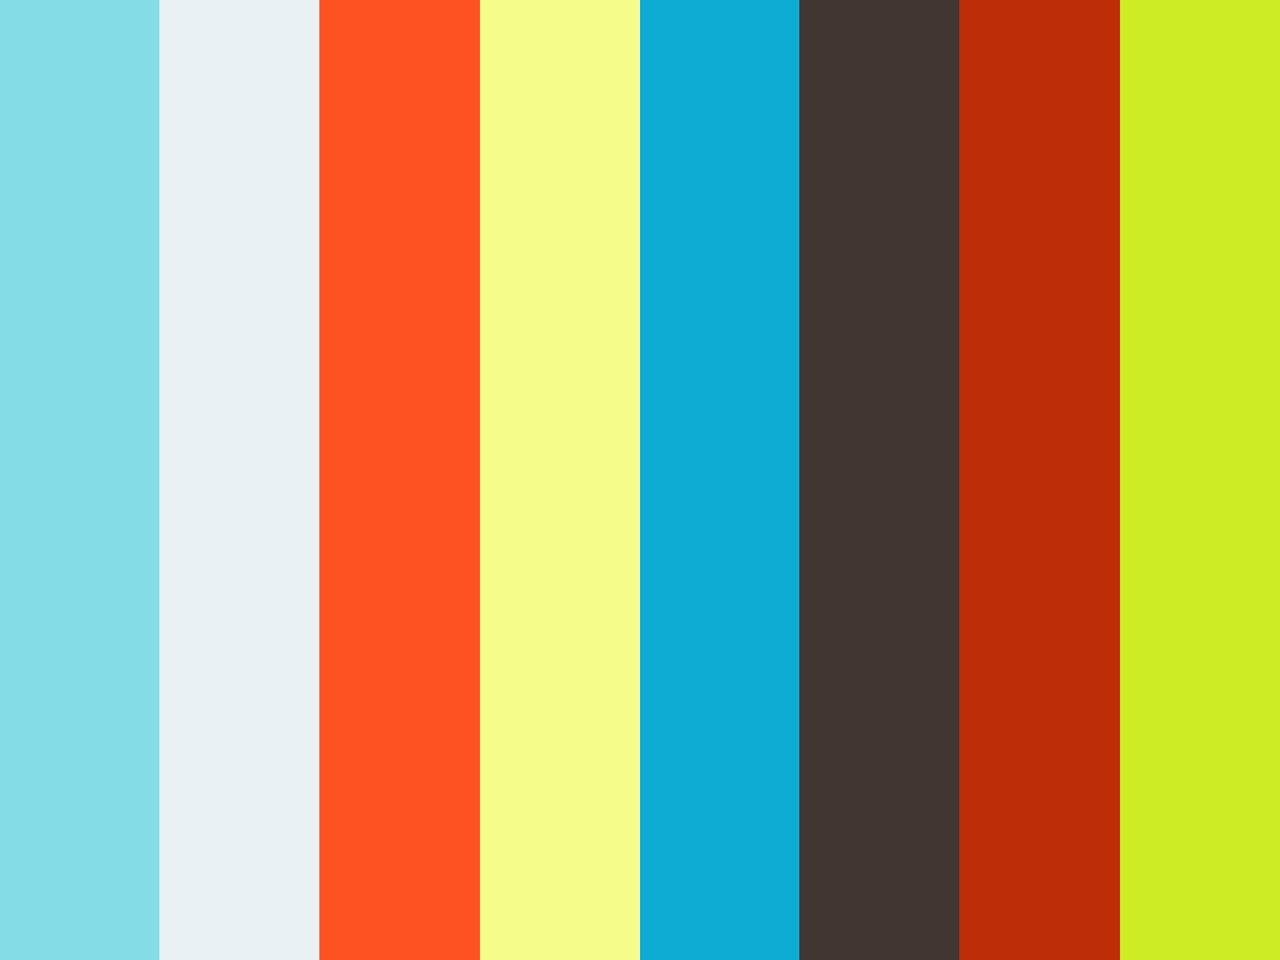 Klondike Space Flavors